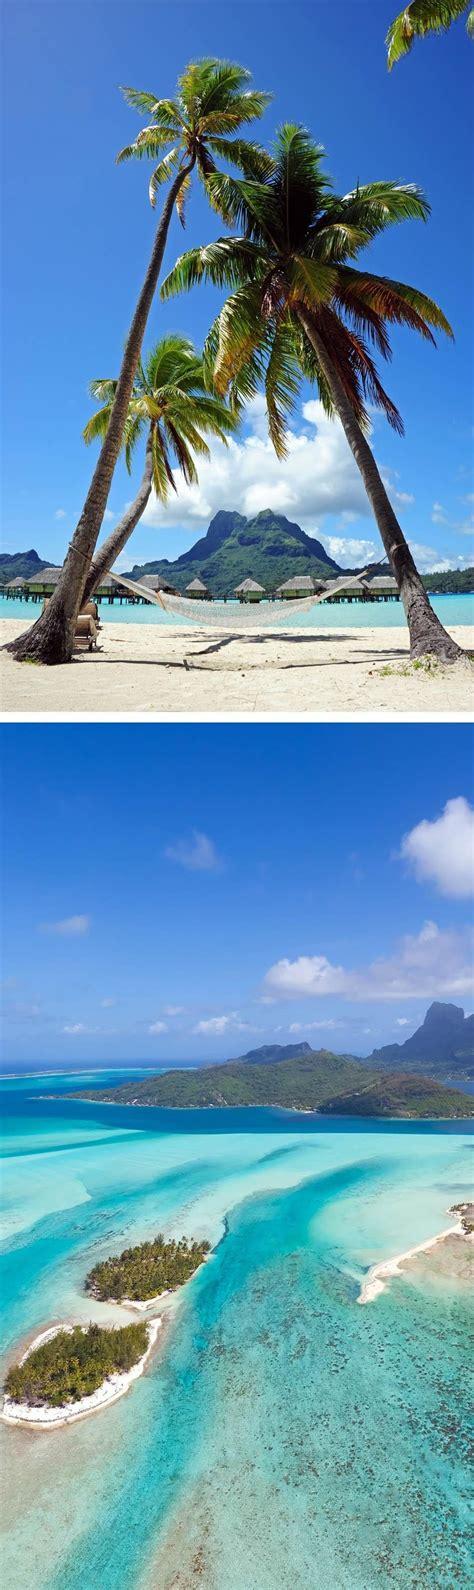 Bora Bora French Polynesia Top 10 Most Beautiful